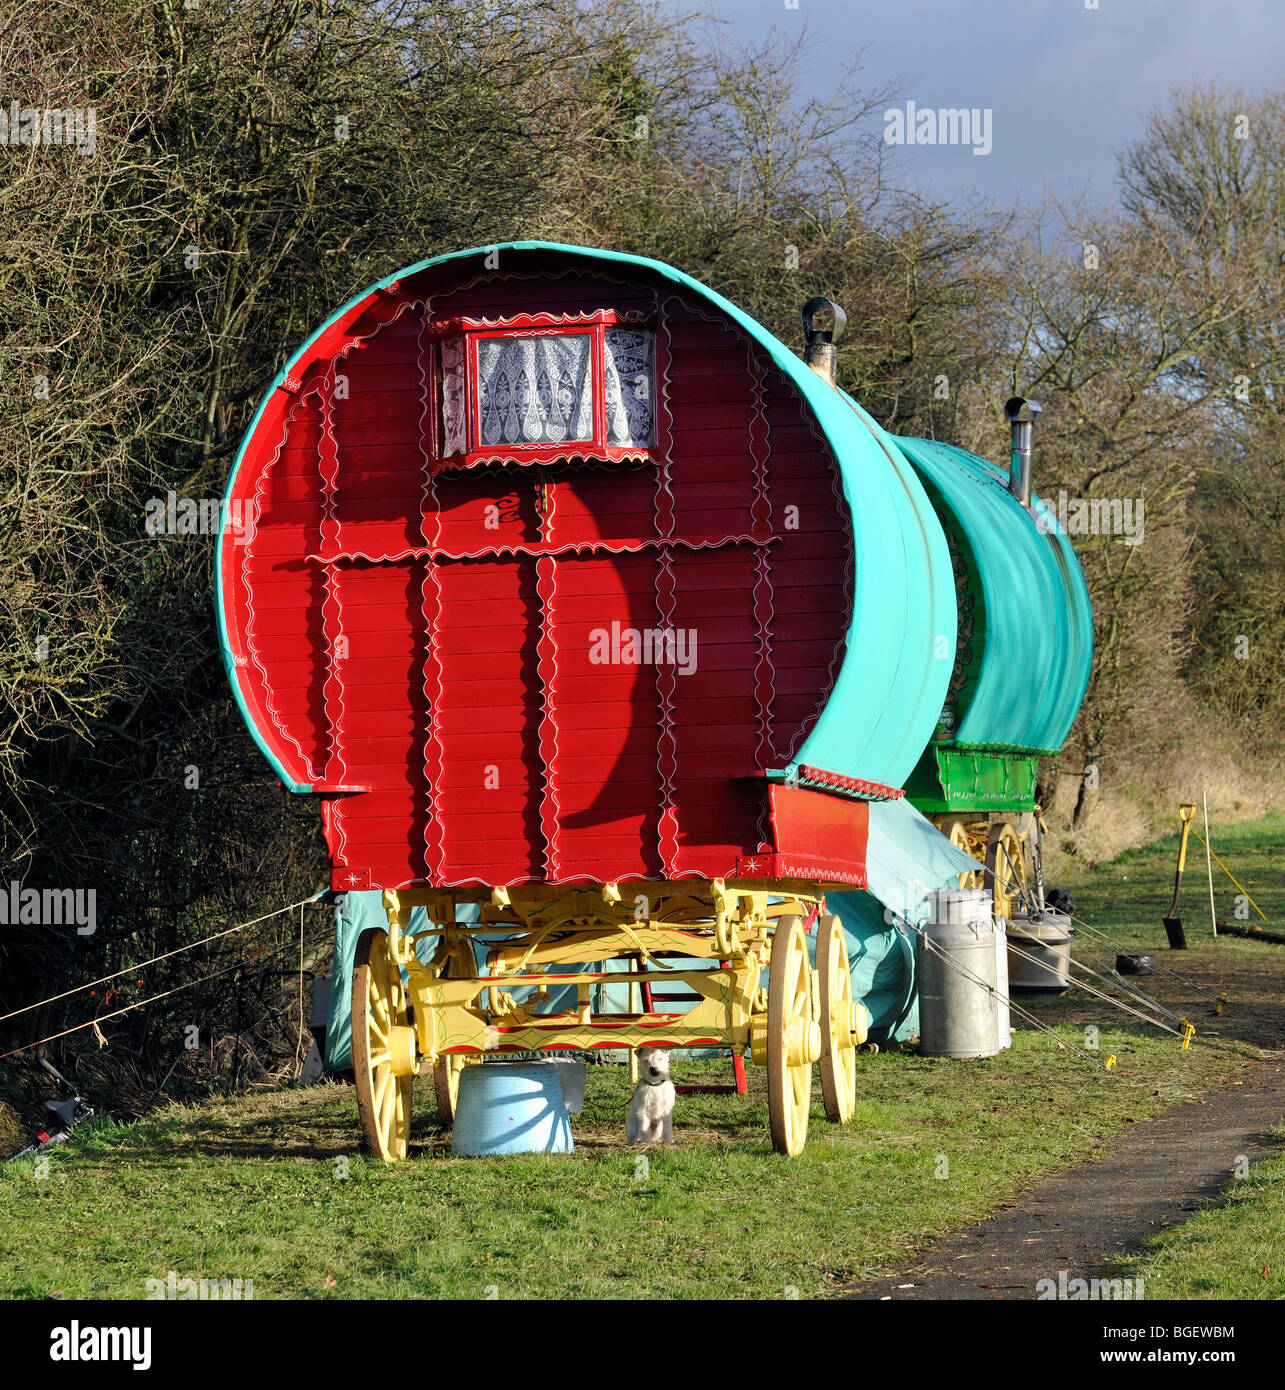 Romani (Gypsy) camp at the roadside on the B3407, Hampshire, England, UK. - Stock Image